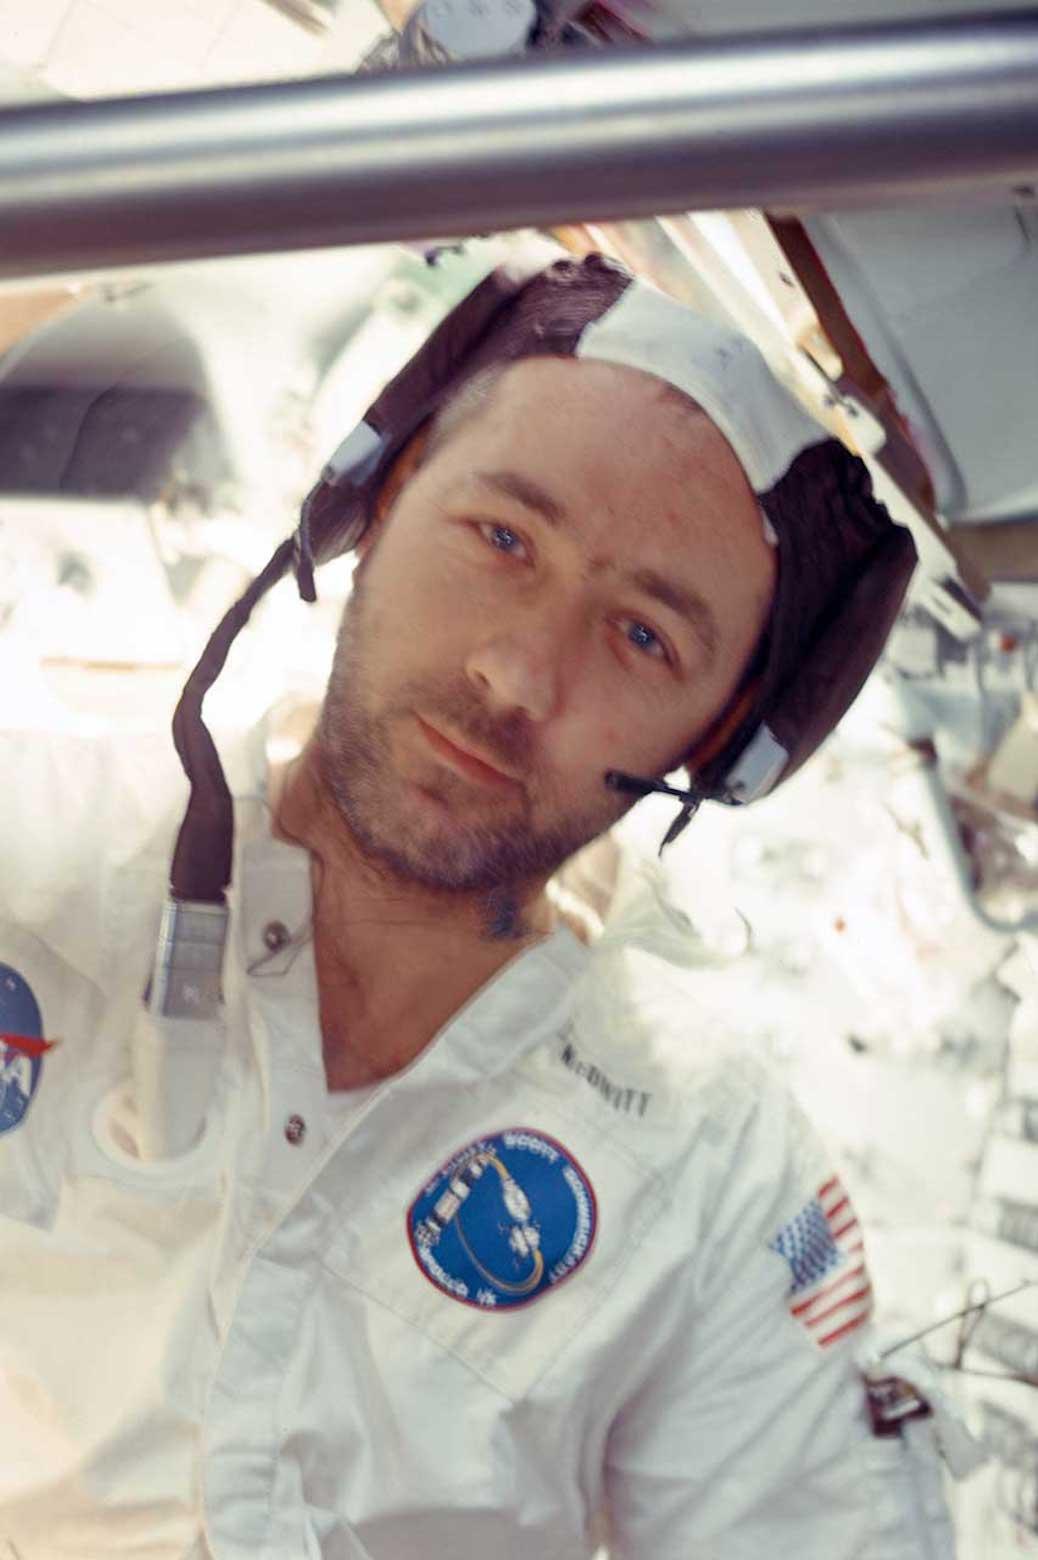 Portrait of James McDivitt in astronaut uniform